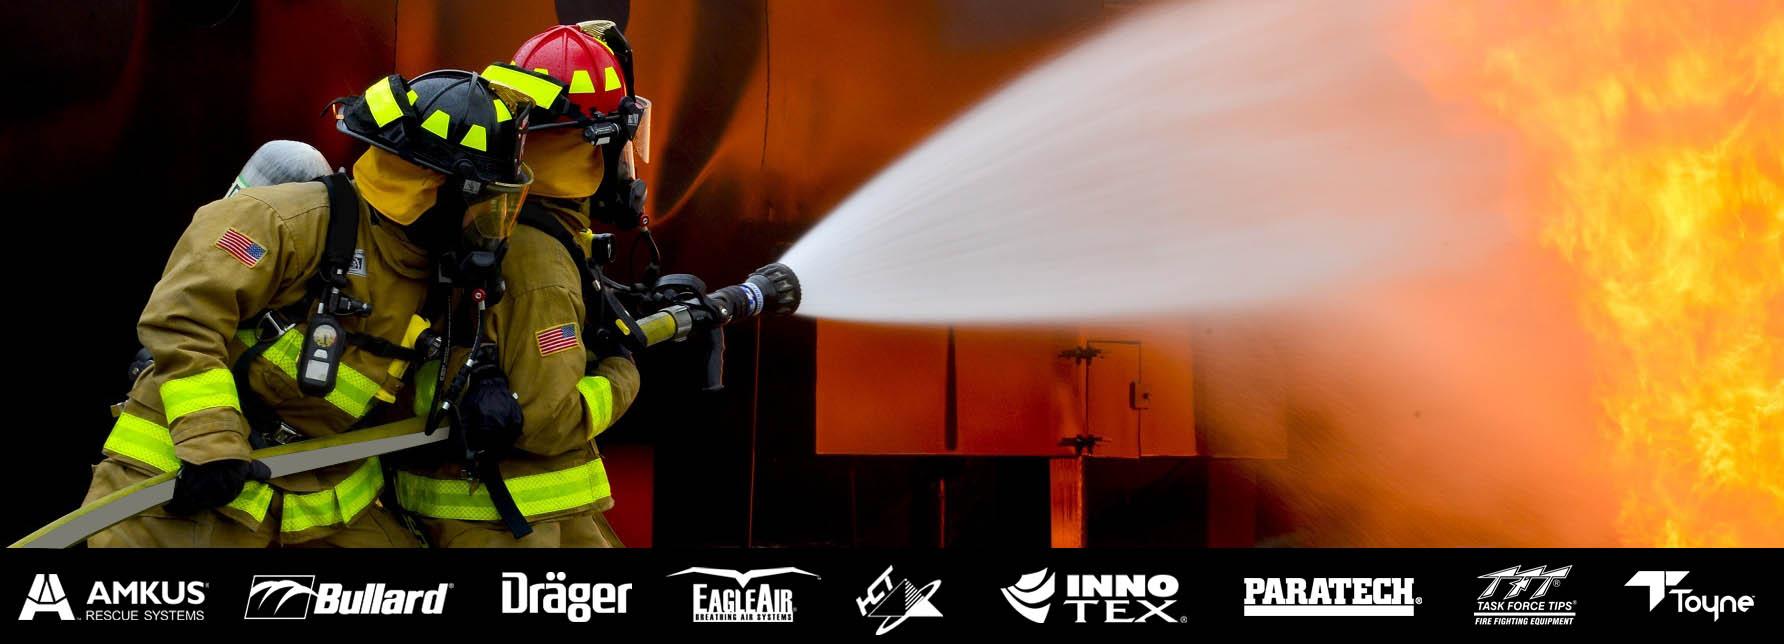 Fire Equipment (featured vendors)